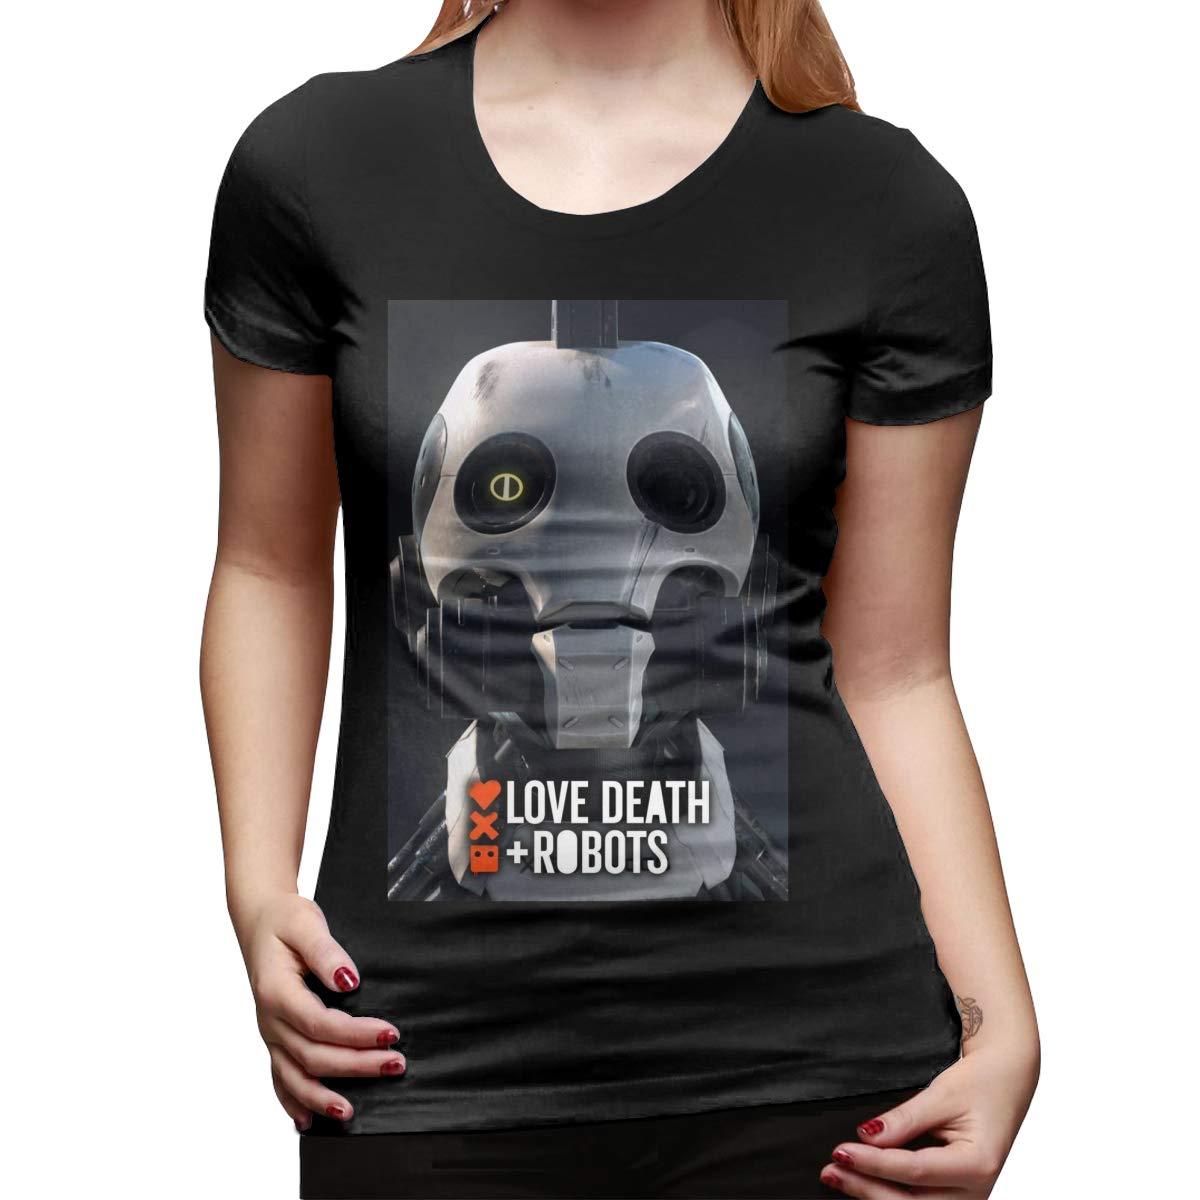 HAYDEN Womens Custom Cute Tees Love,Death/&Robots Short Sleeve Classic Tshirts Black